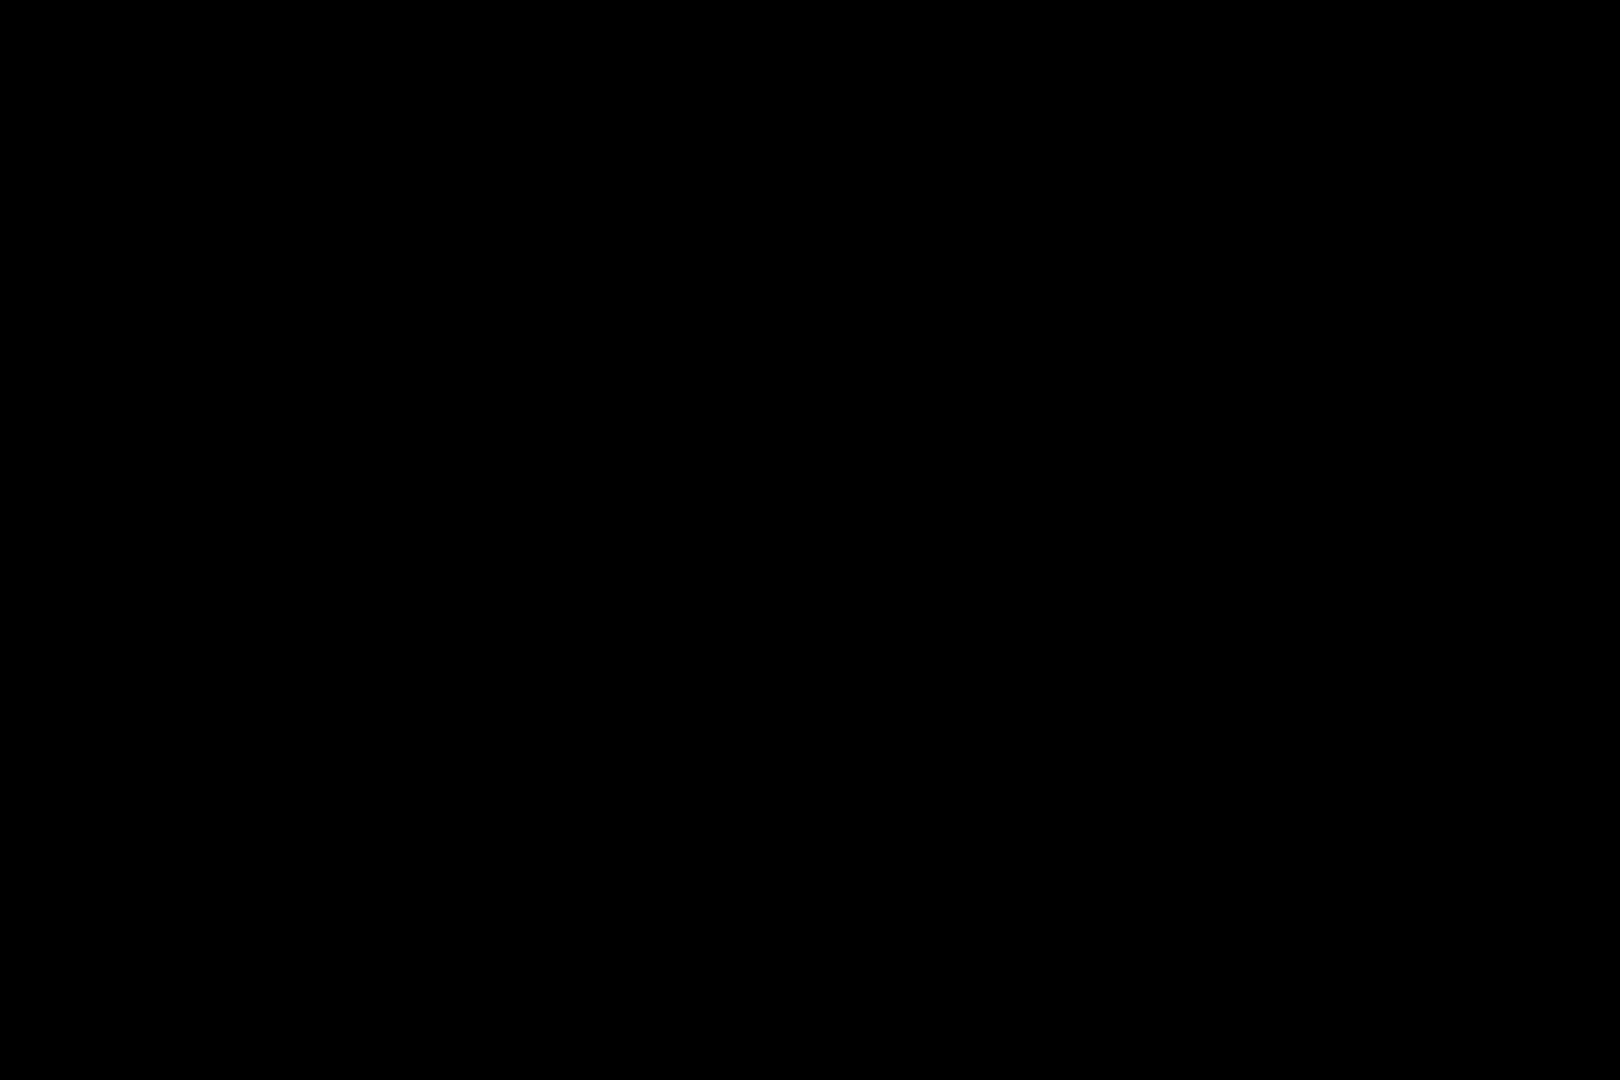 Aquaな露天風呂Vol.480 盗撮シリーズ | 露天風呂編  102PIX 17